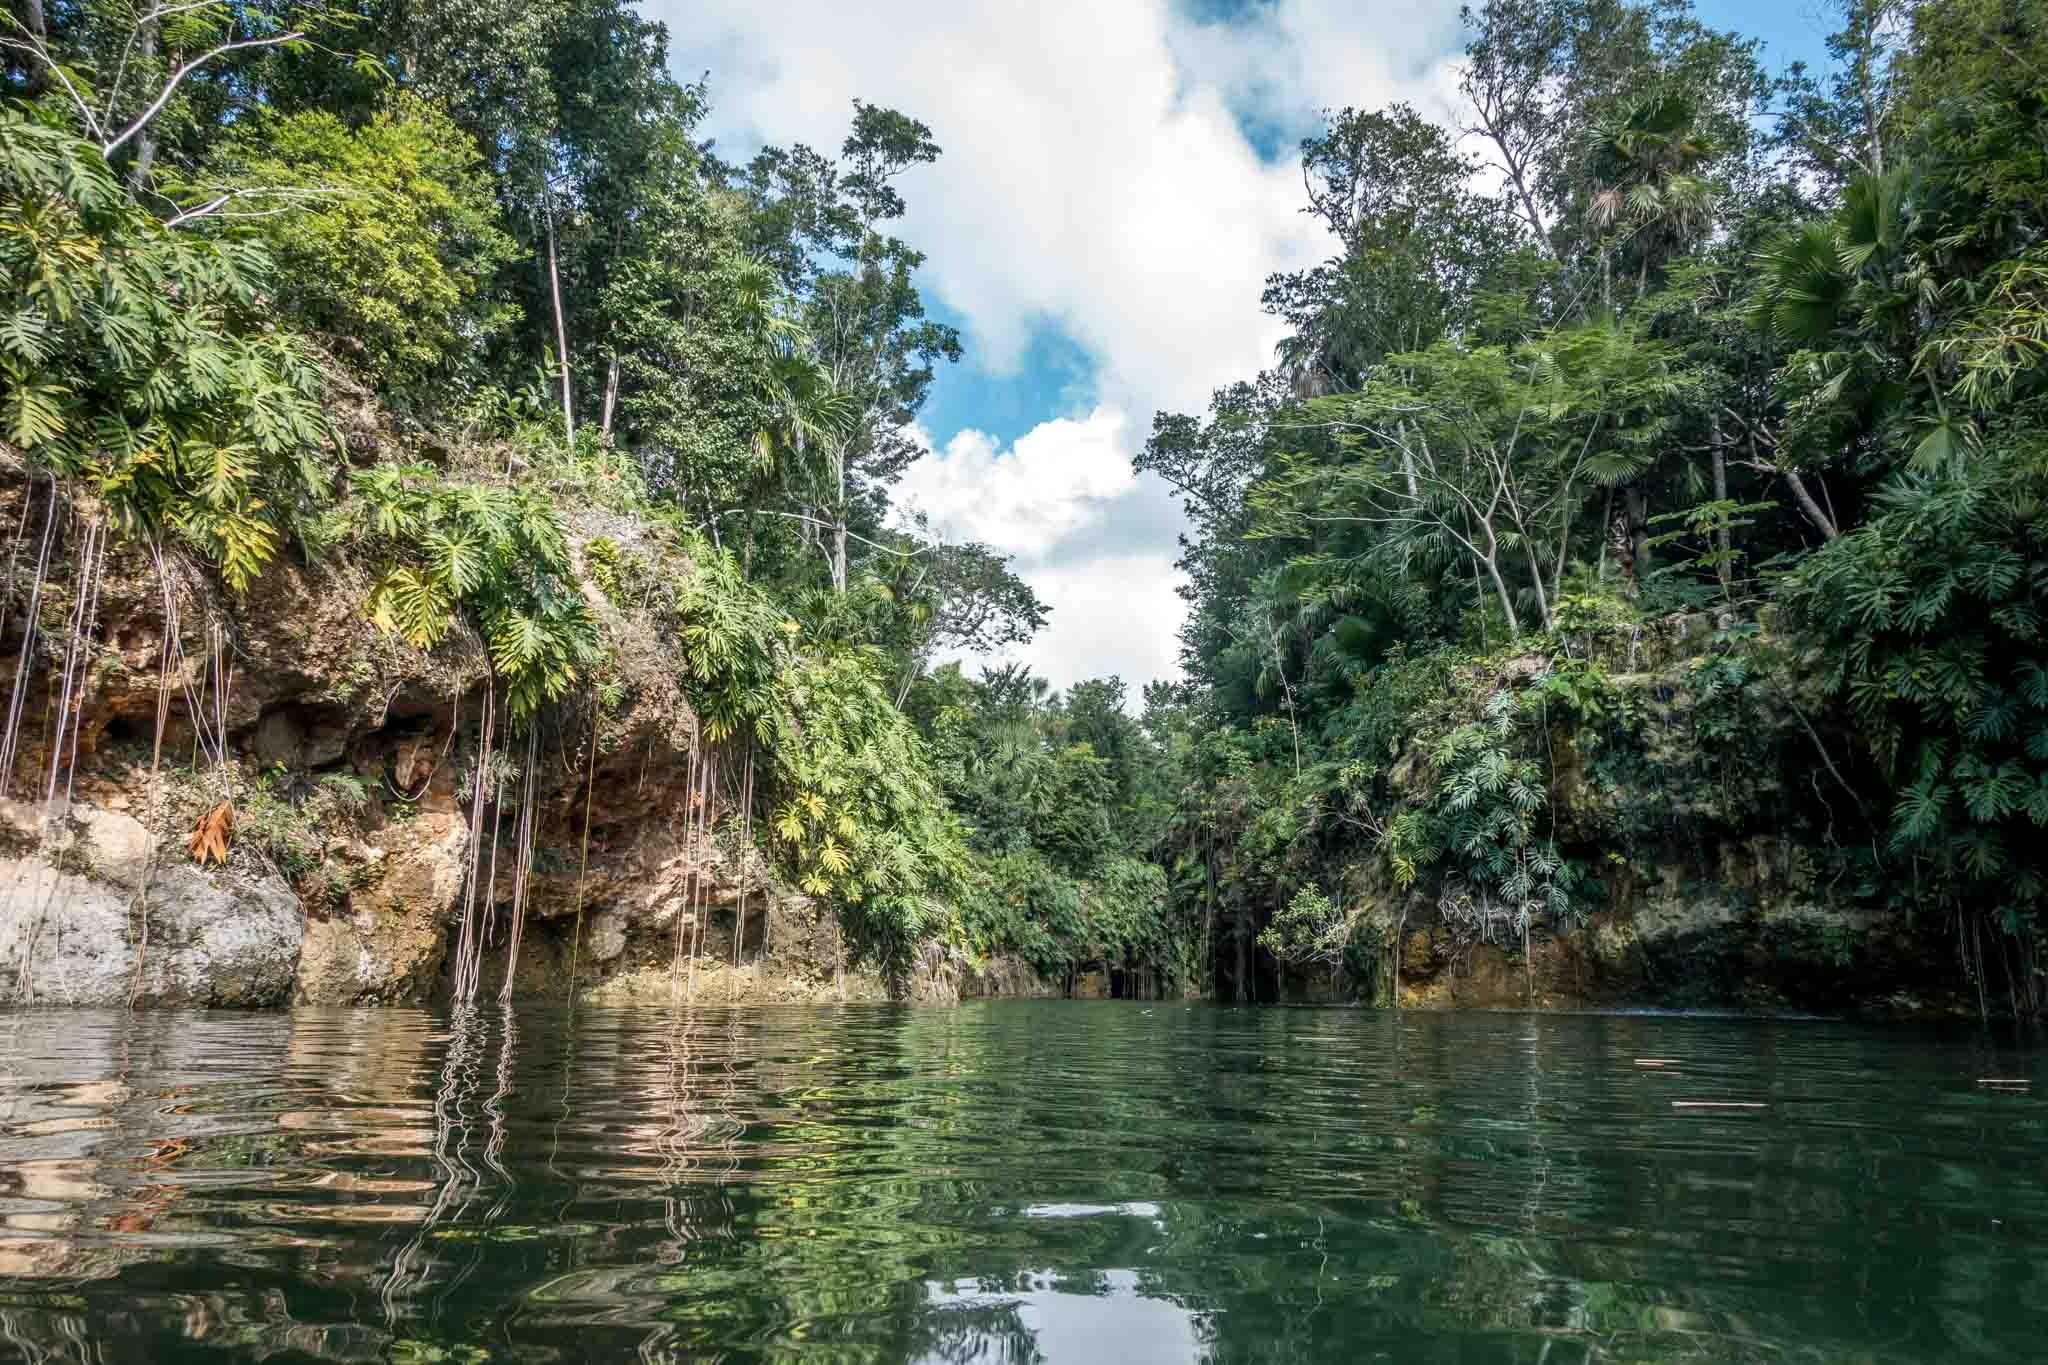 Swimming through a cenote near Playa del Carmen on the Xenotes Oasis Maya tour